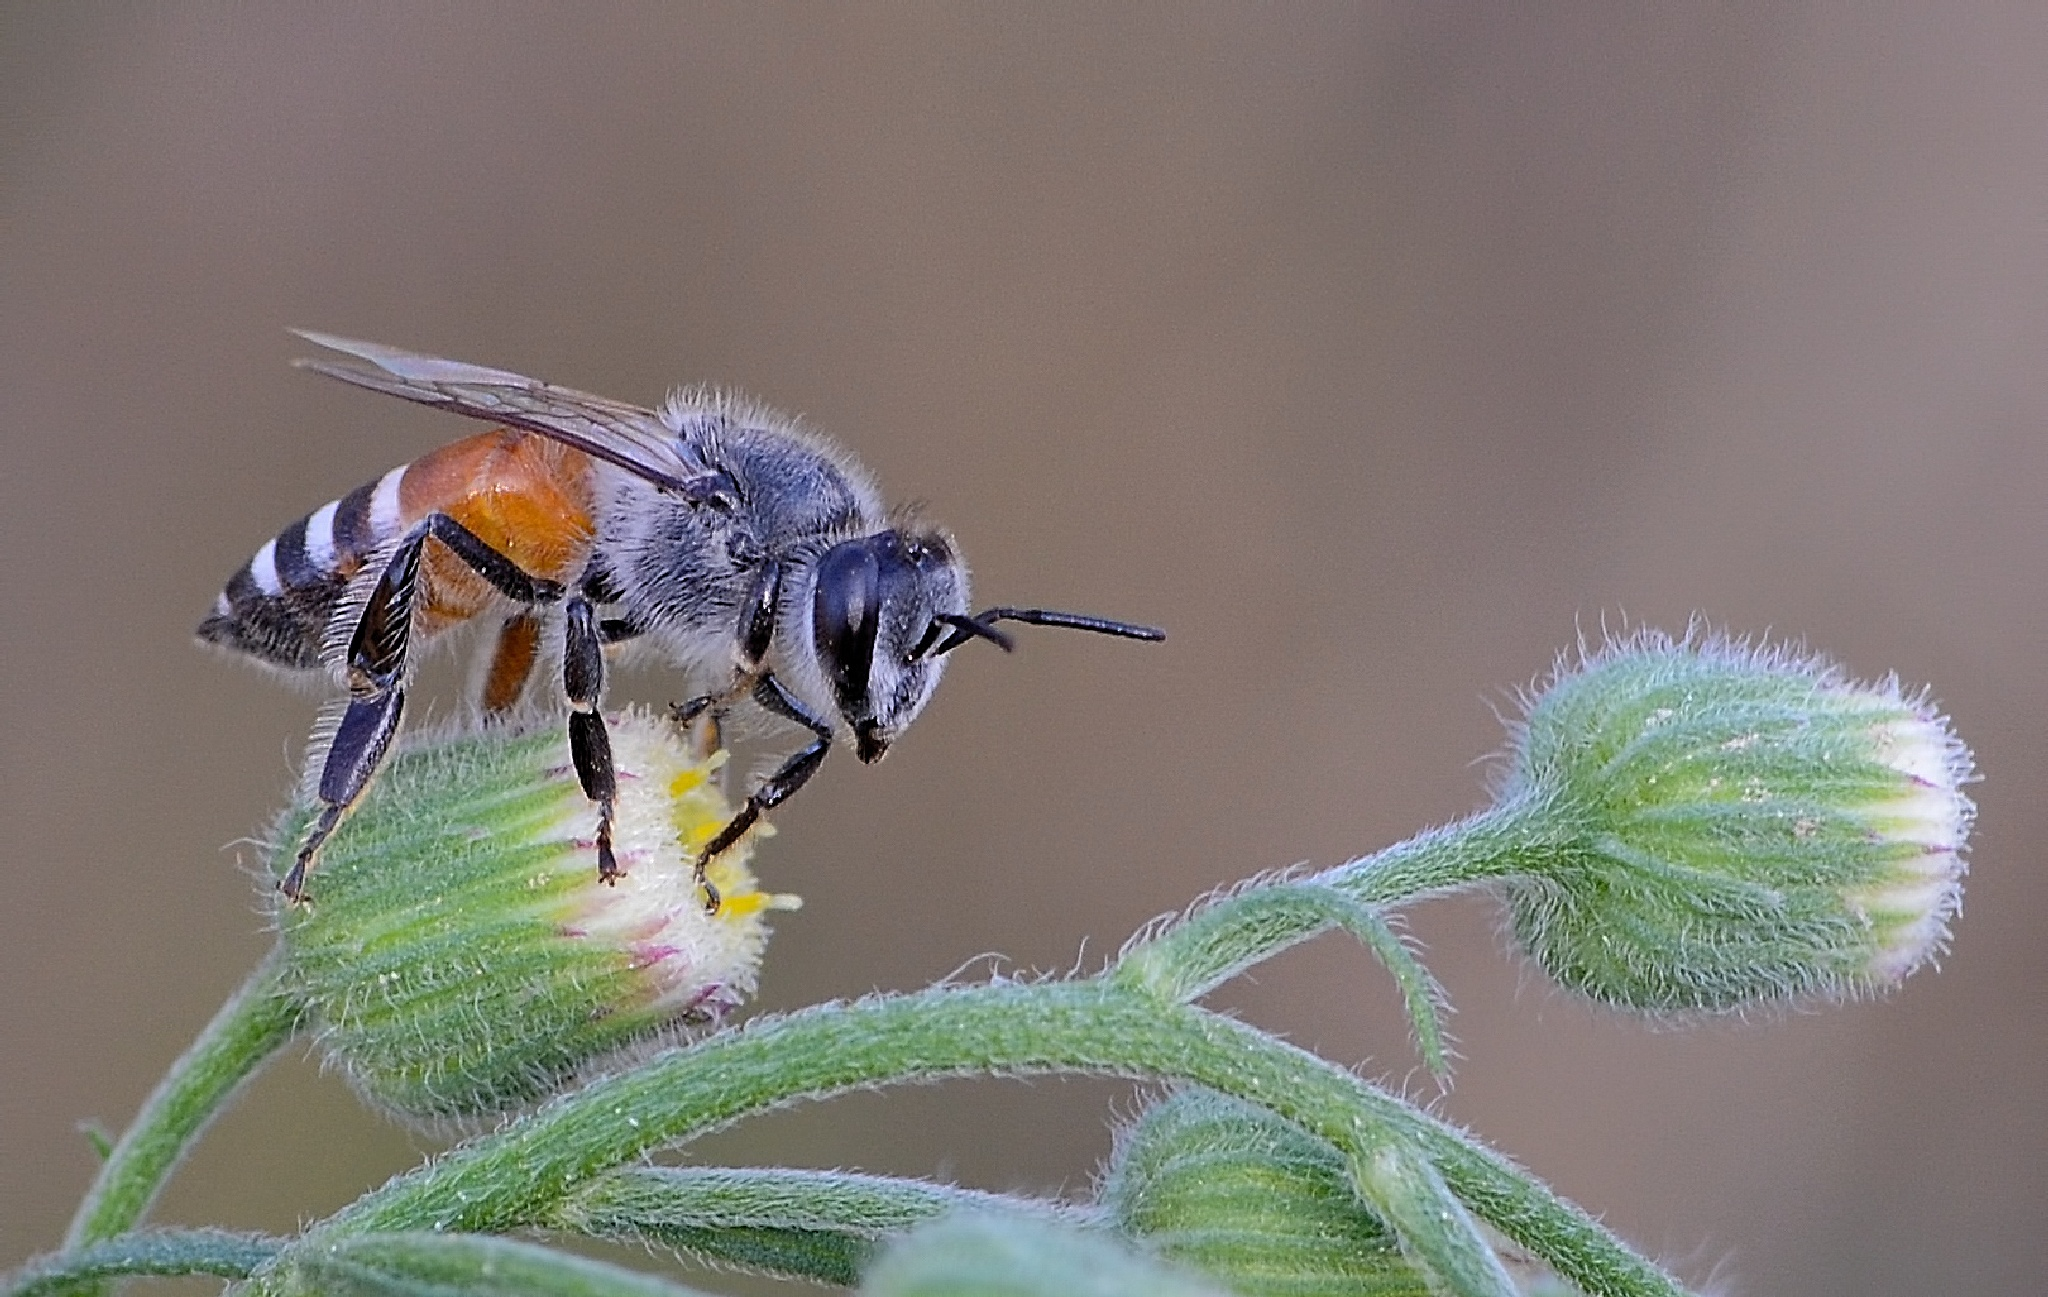 Zorova Bee by malekjmd10